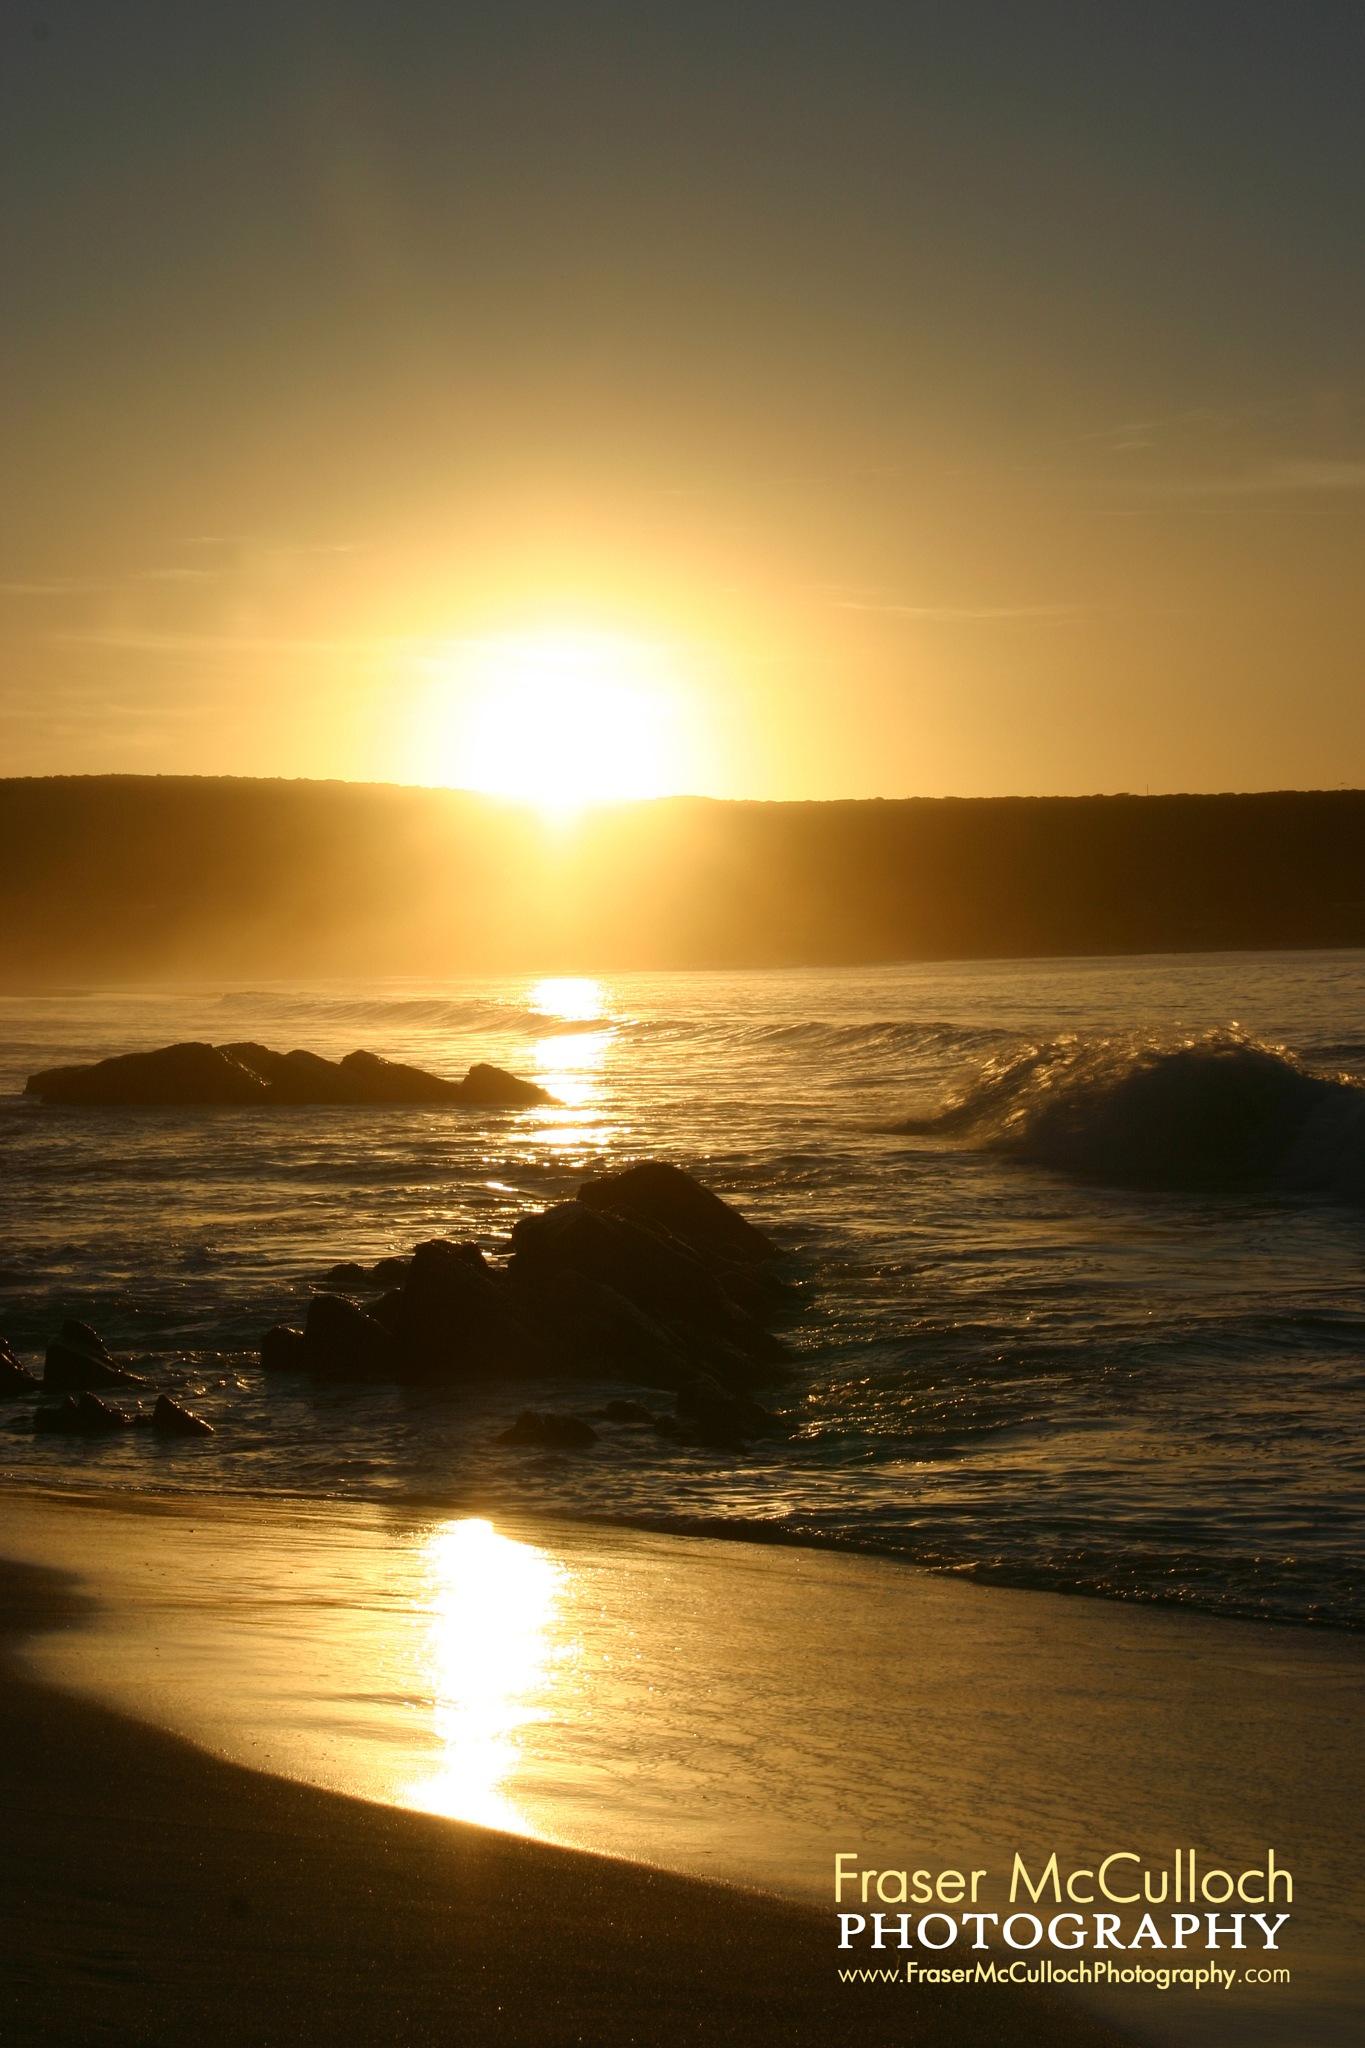 Ocean Sunset by Fraser McCulloch